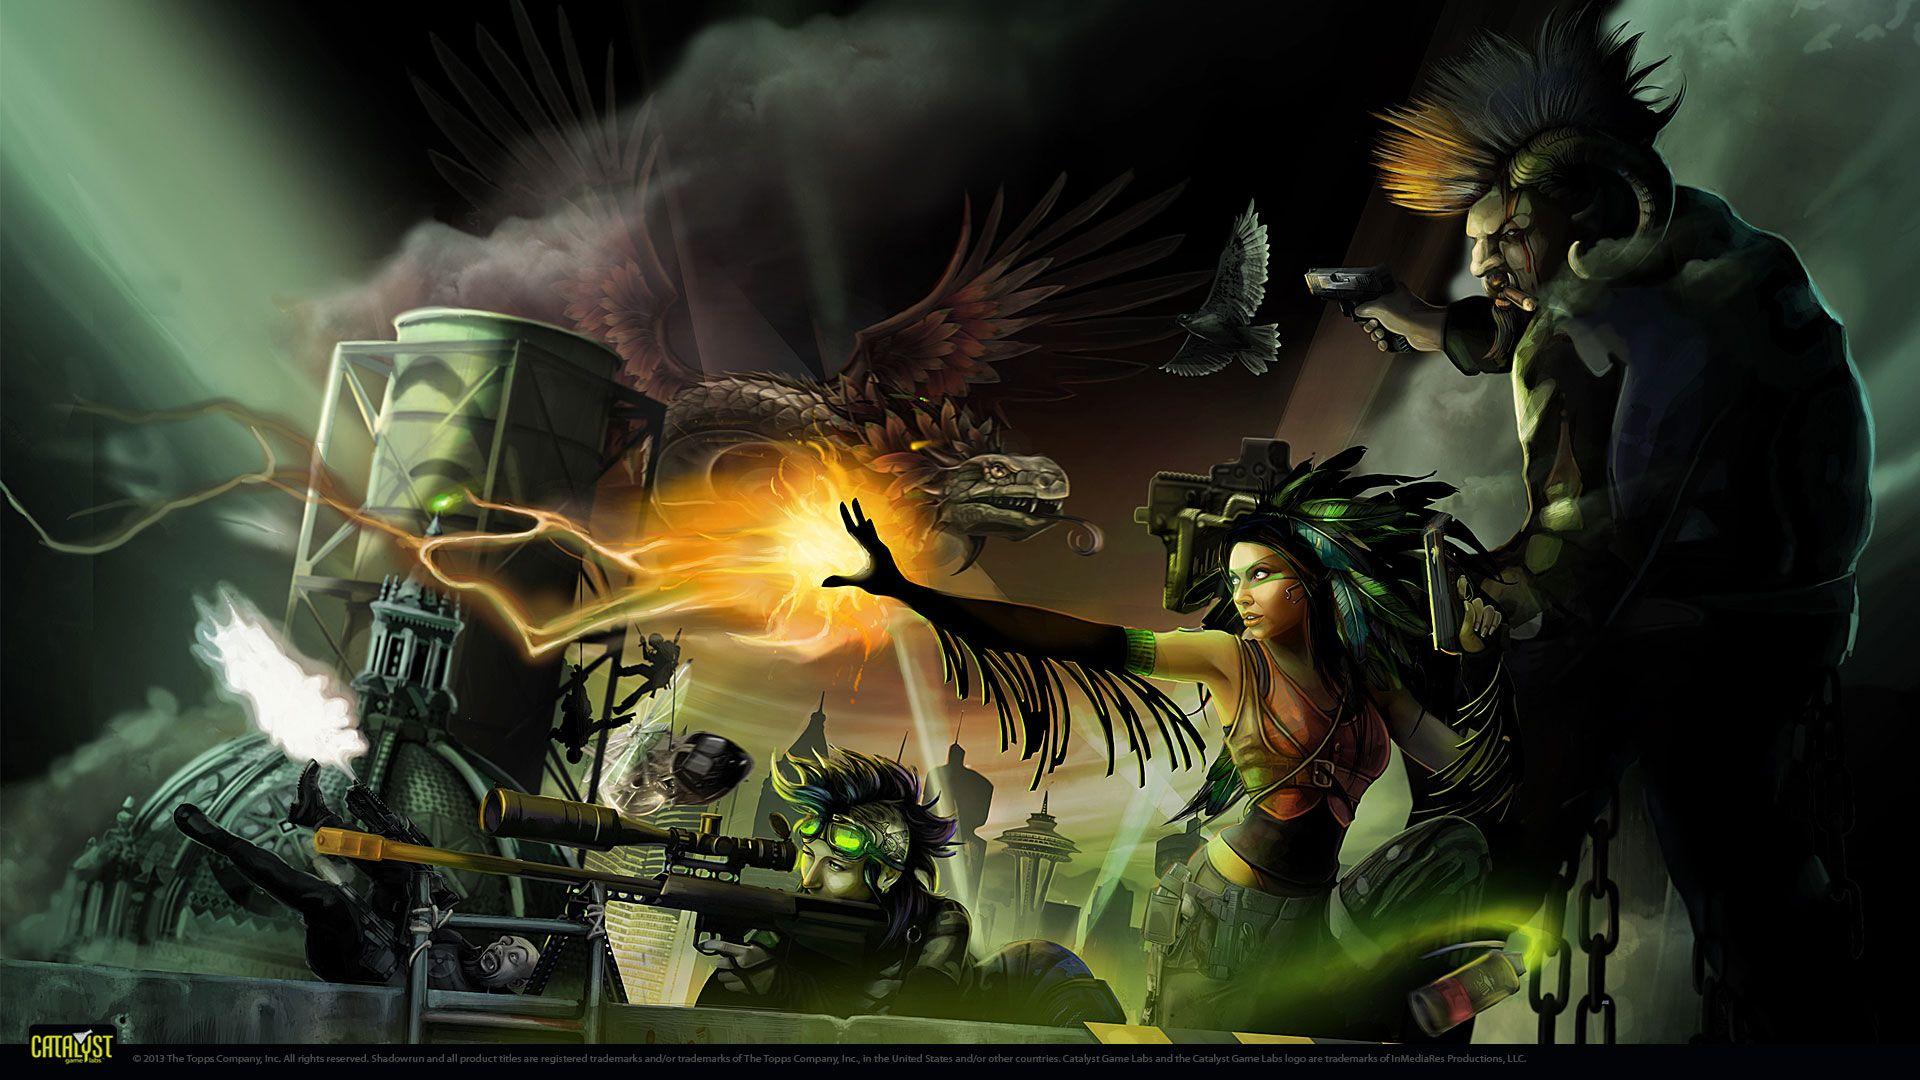 Wallpapers Shadowrun 5 Shadowrun Fantasy Cyberpunk